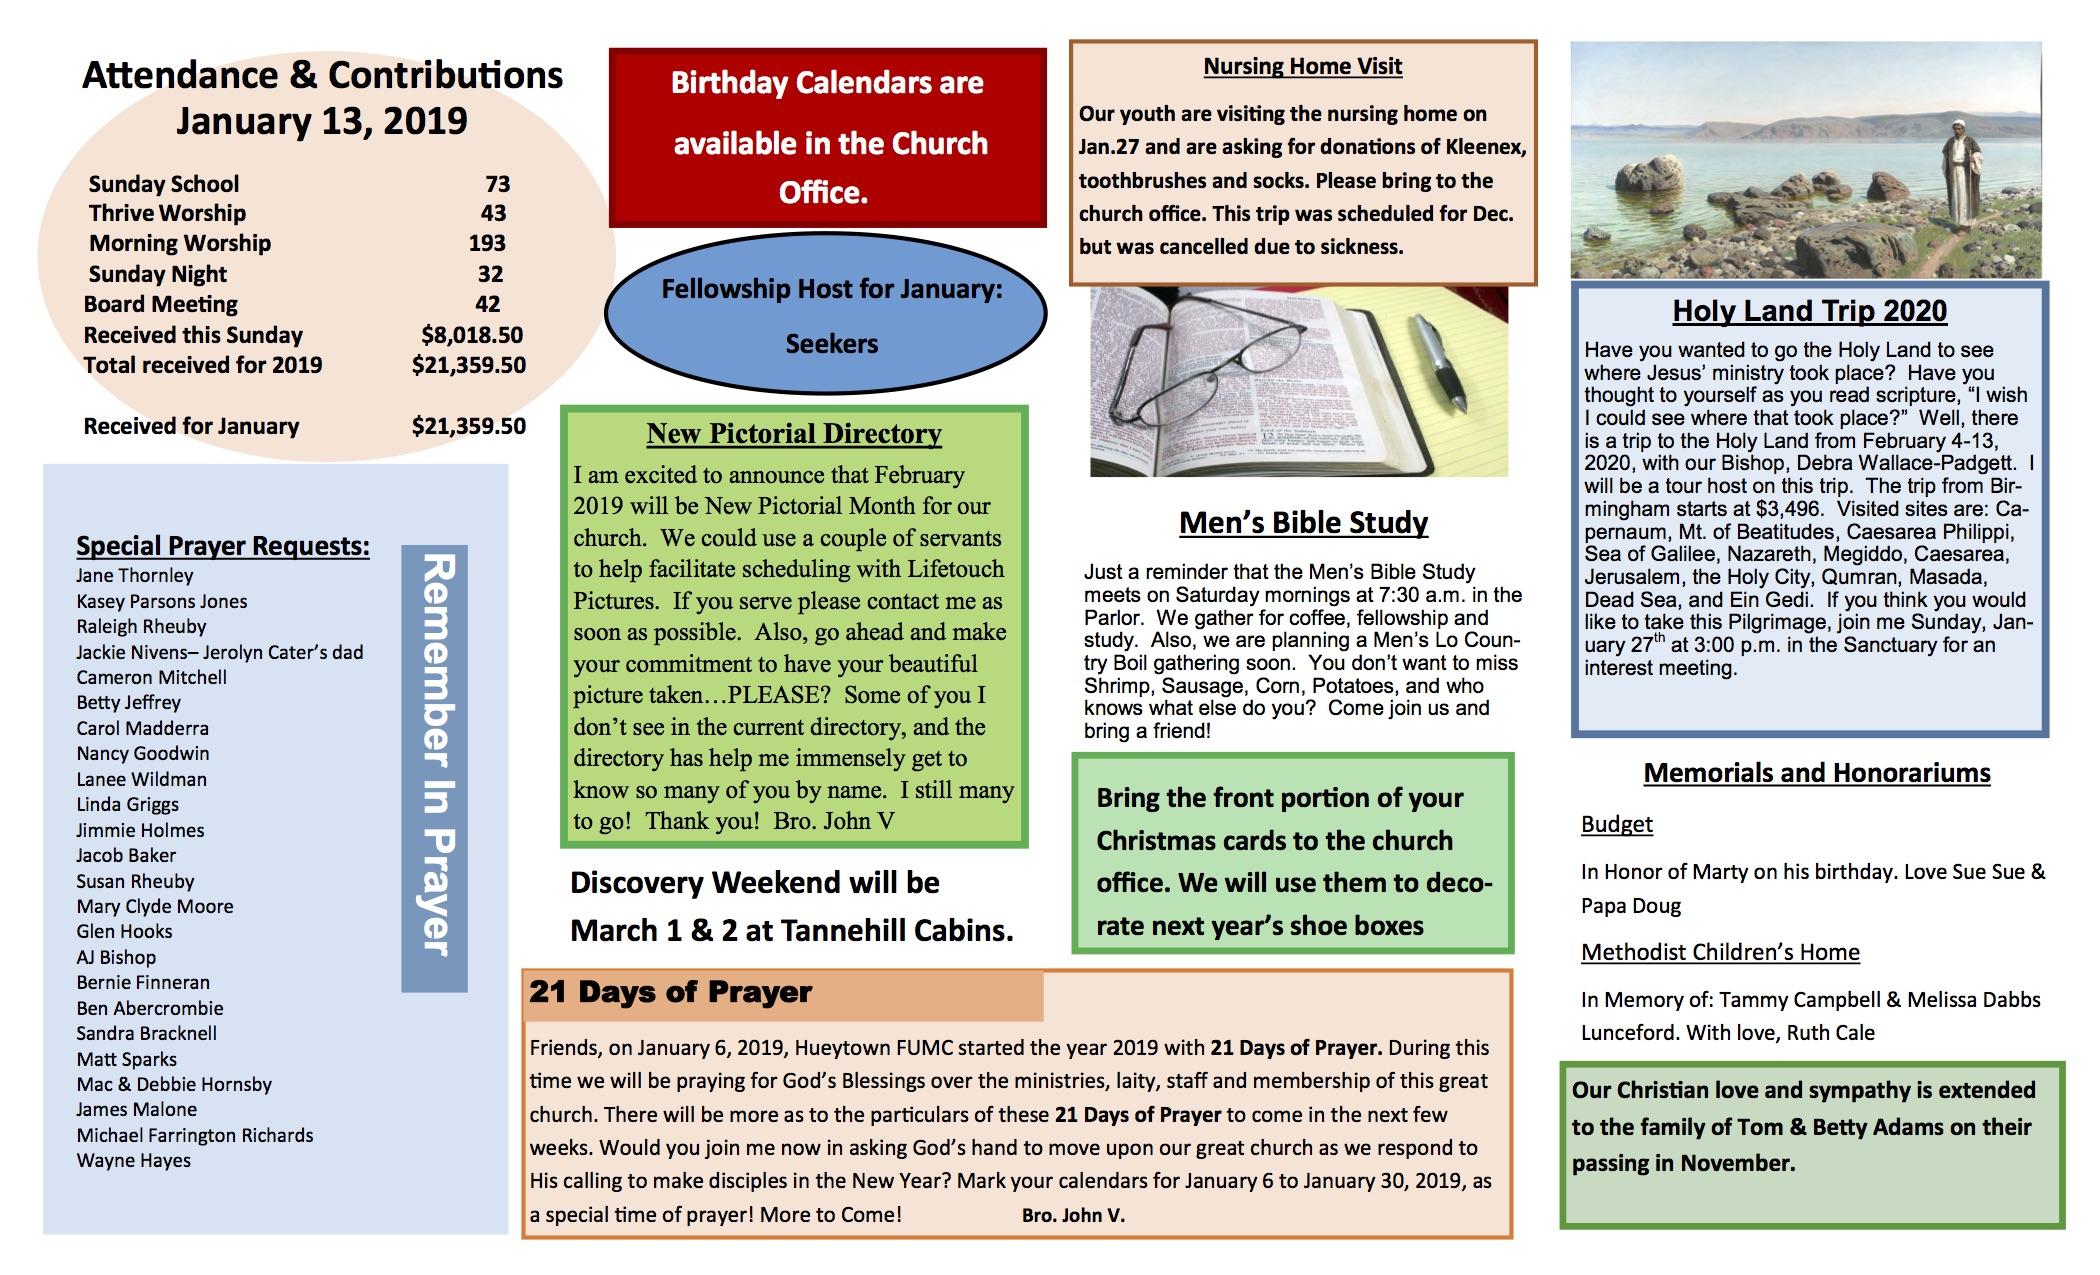 news letter in publisher January 14 2019 pdf.jpg